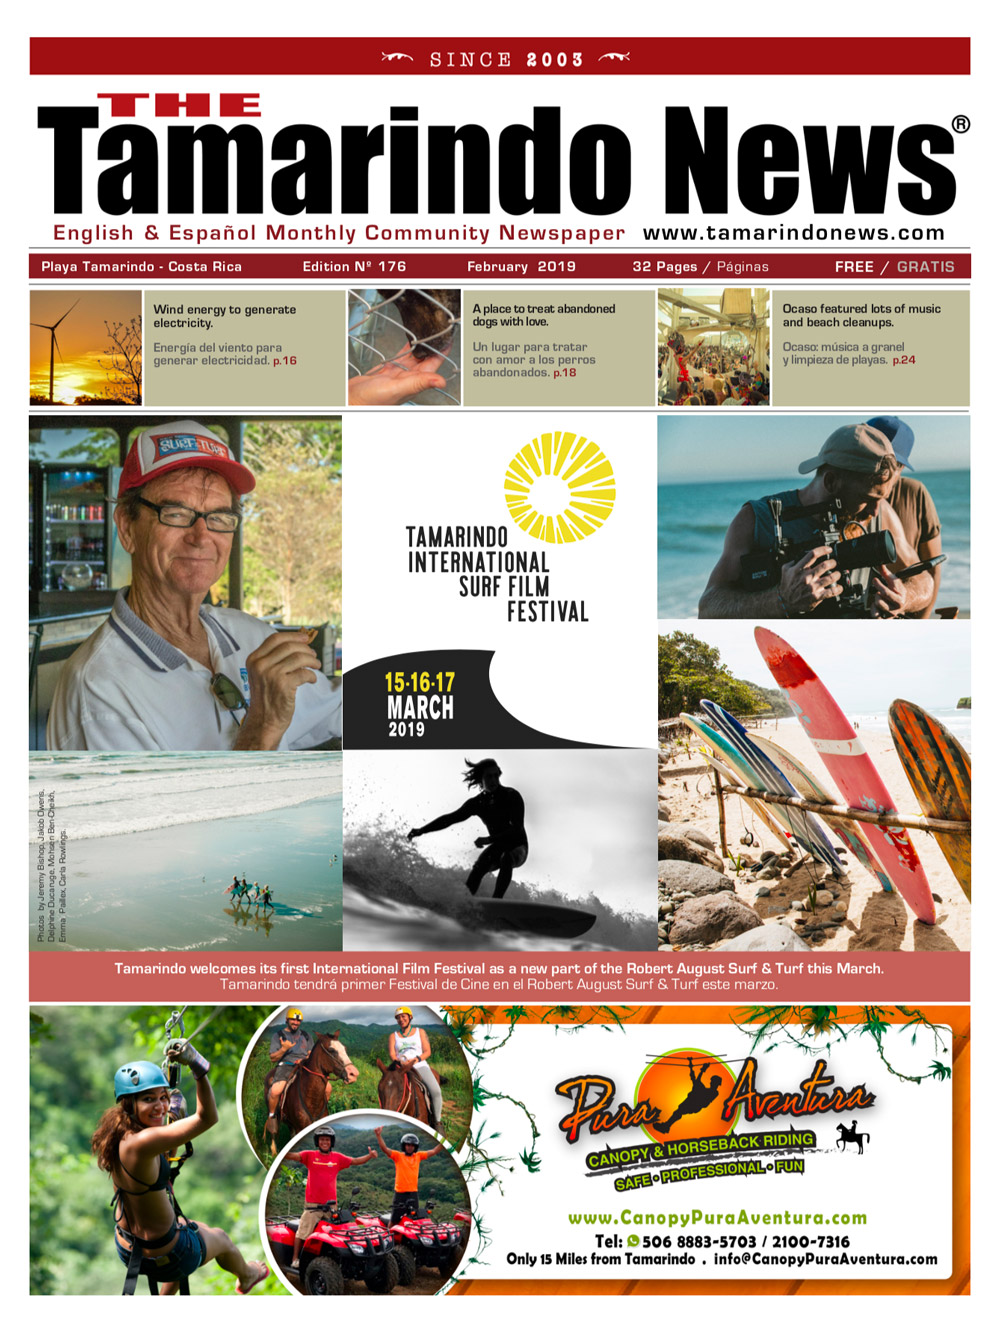 Tamarindo-News-Film-Festival-1.jpg